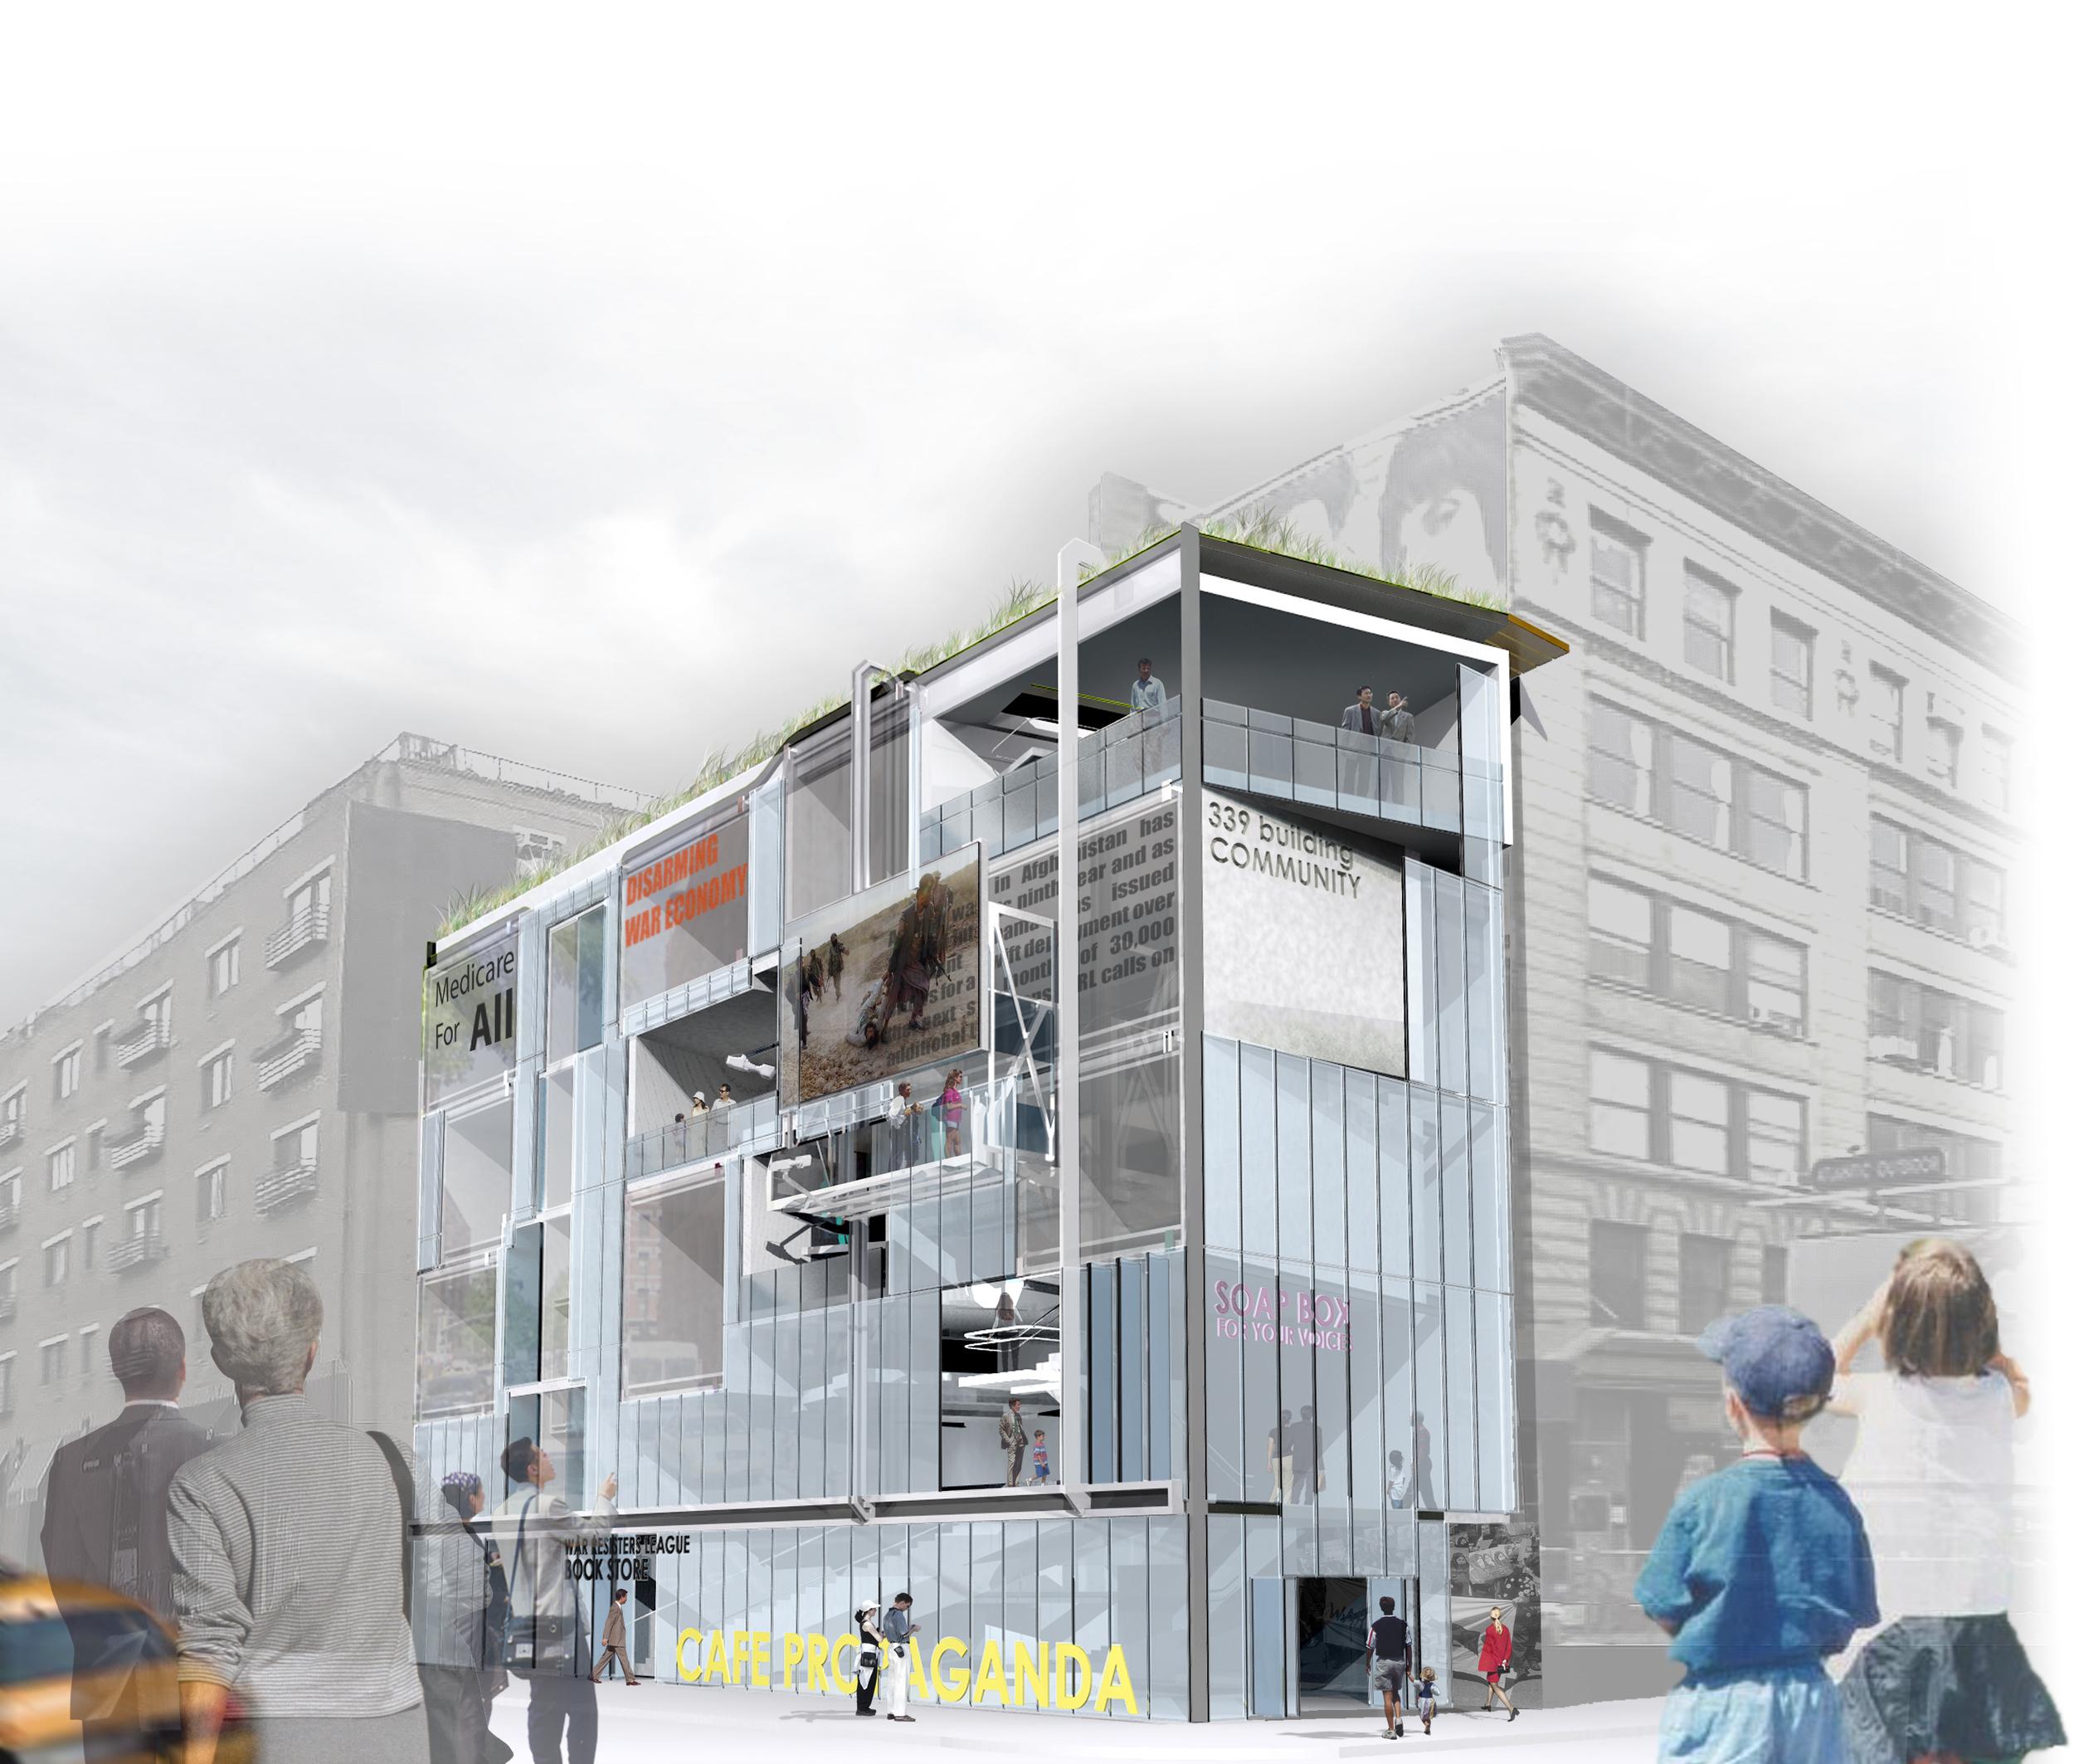 BUILDING-FINAL-final copy.jpg